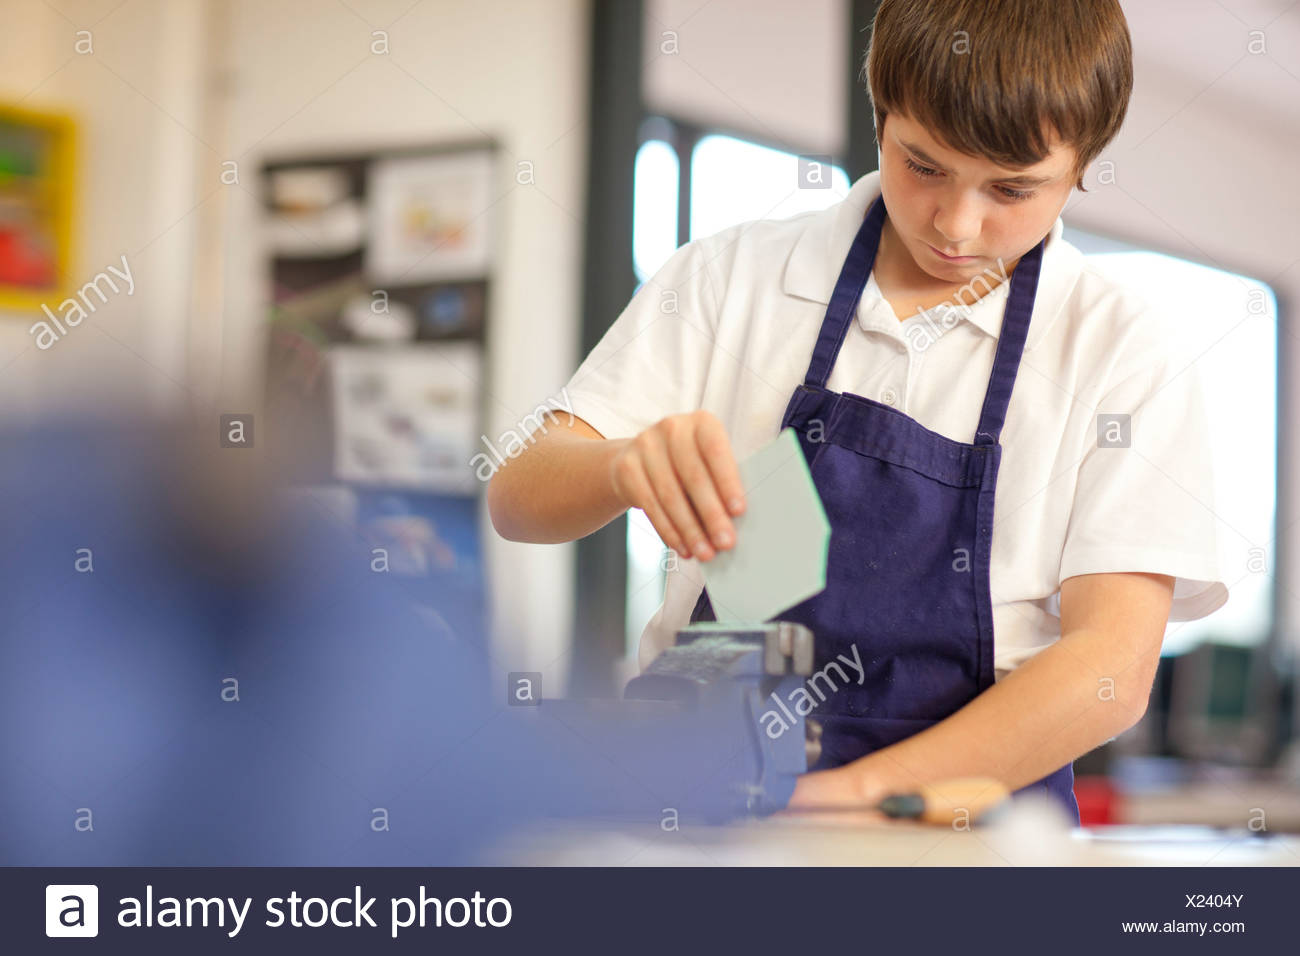 Boy using vice in school workshop - Stock Image